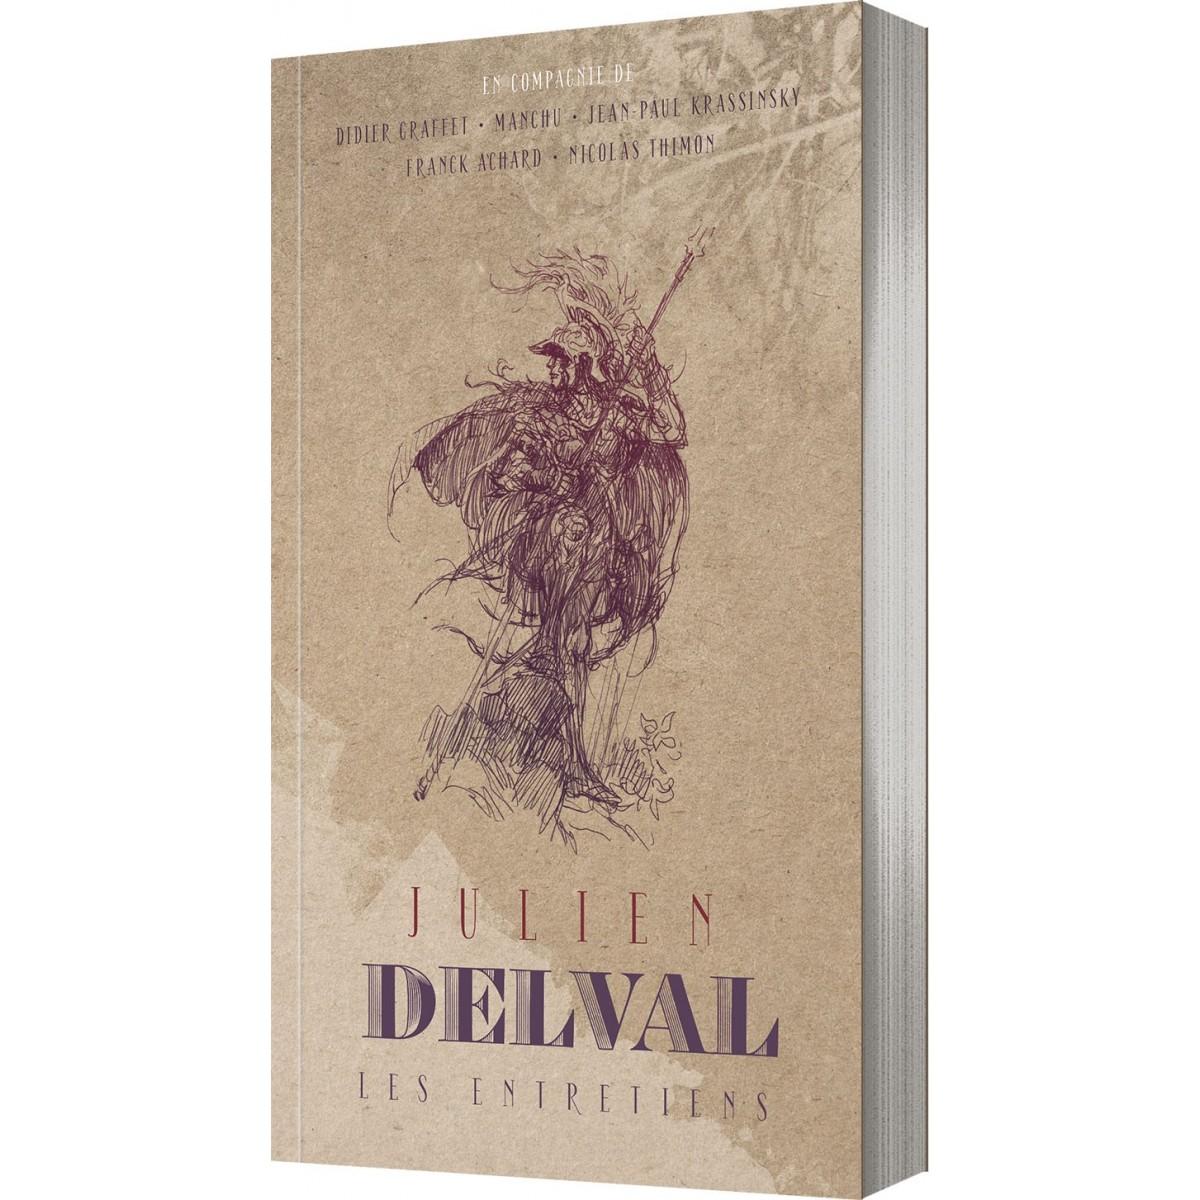 Julien Delval - Entretiens